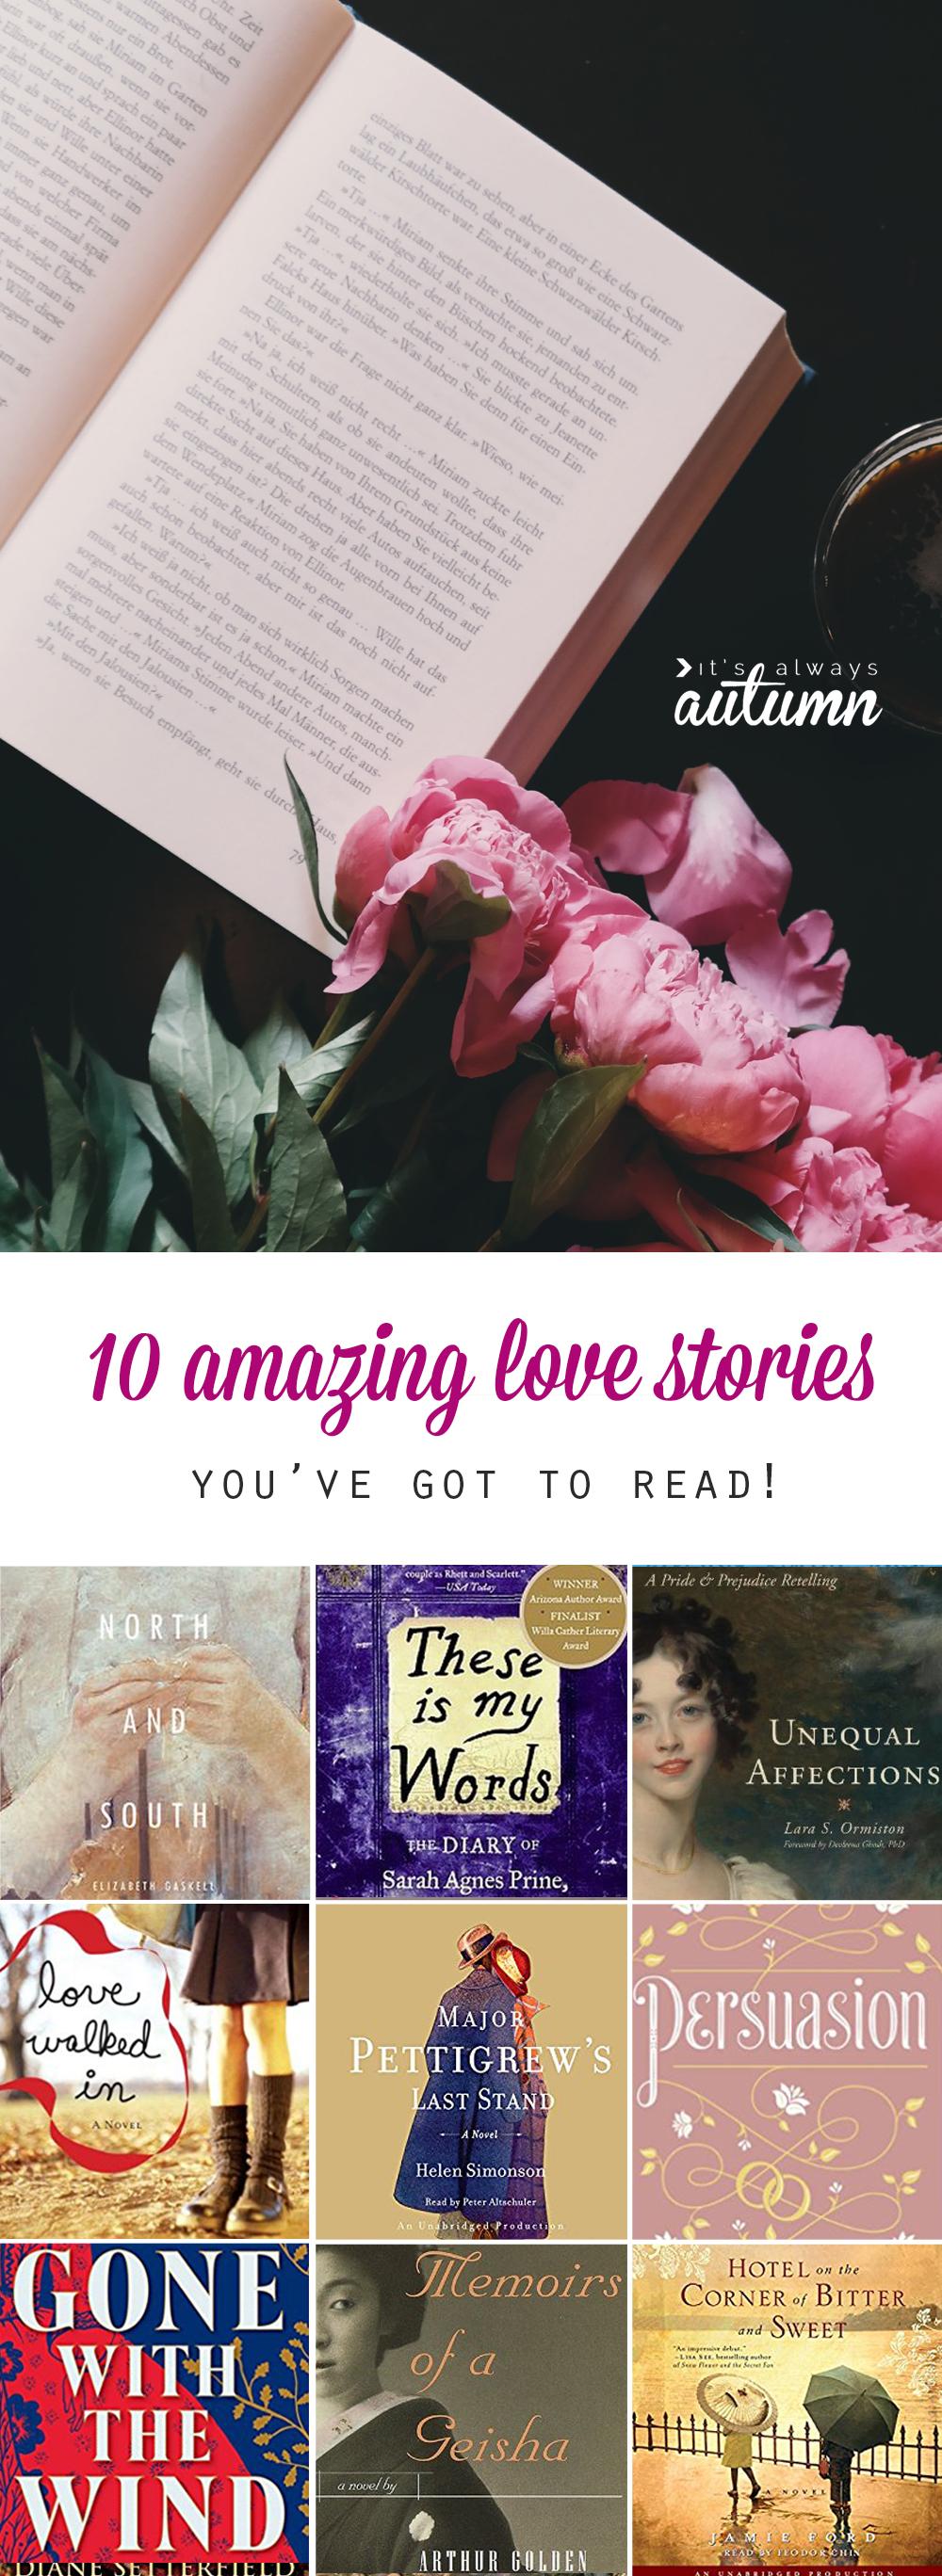 10 fantastic love stories